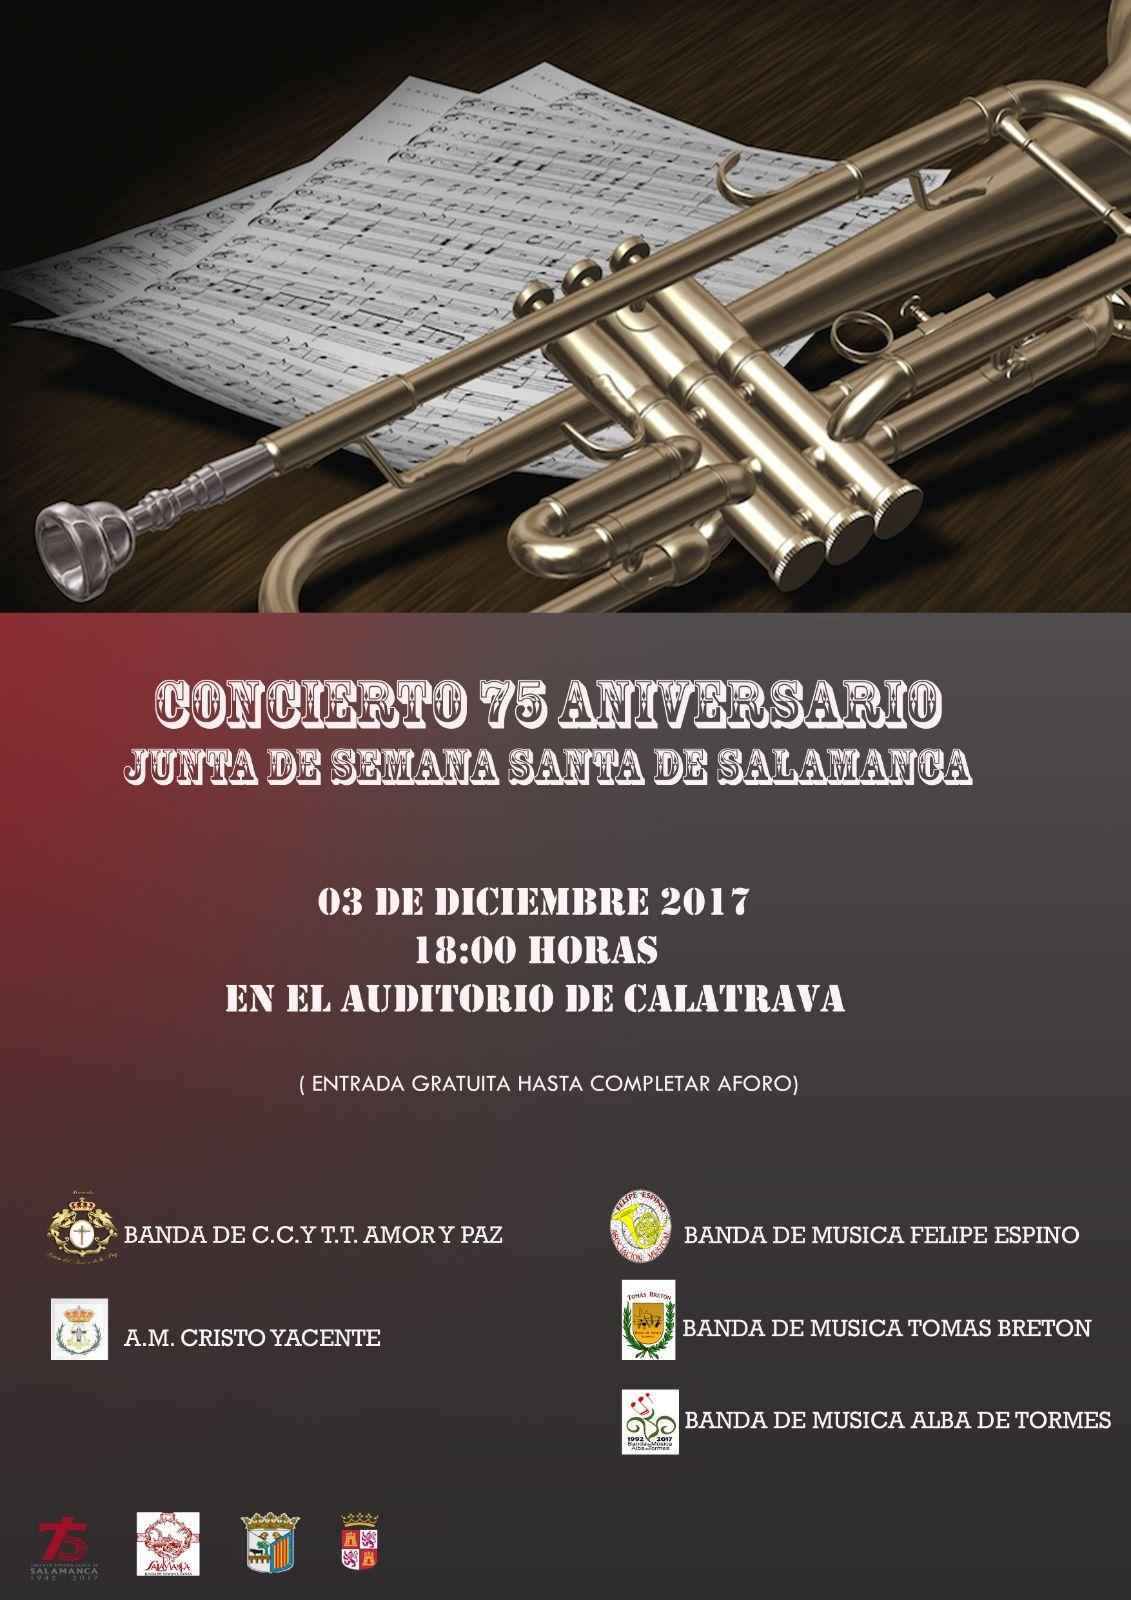 Auditorio Calatrava Vamos de paseo Salamanca Diciembre 2017